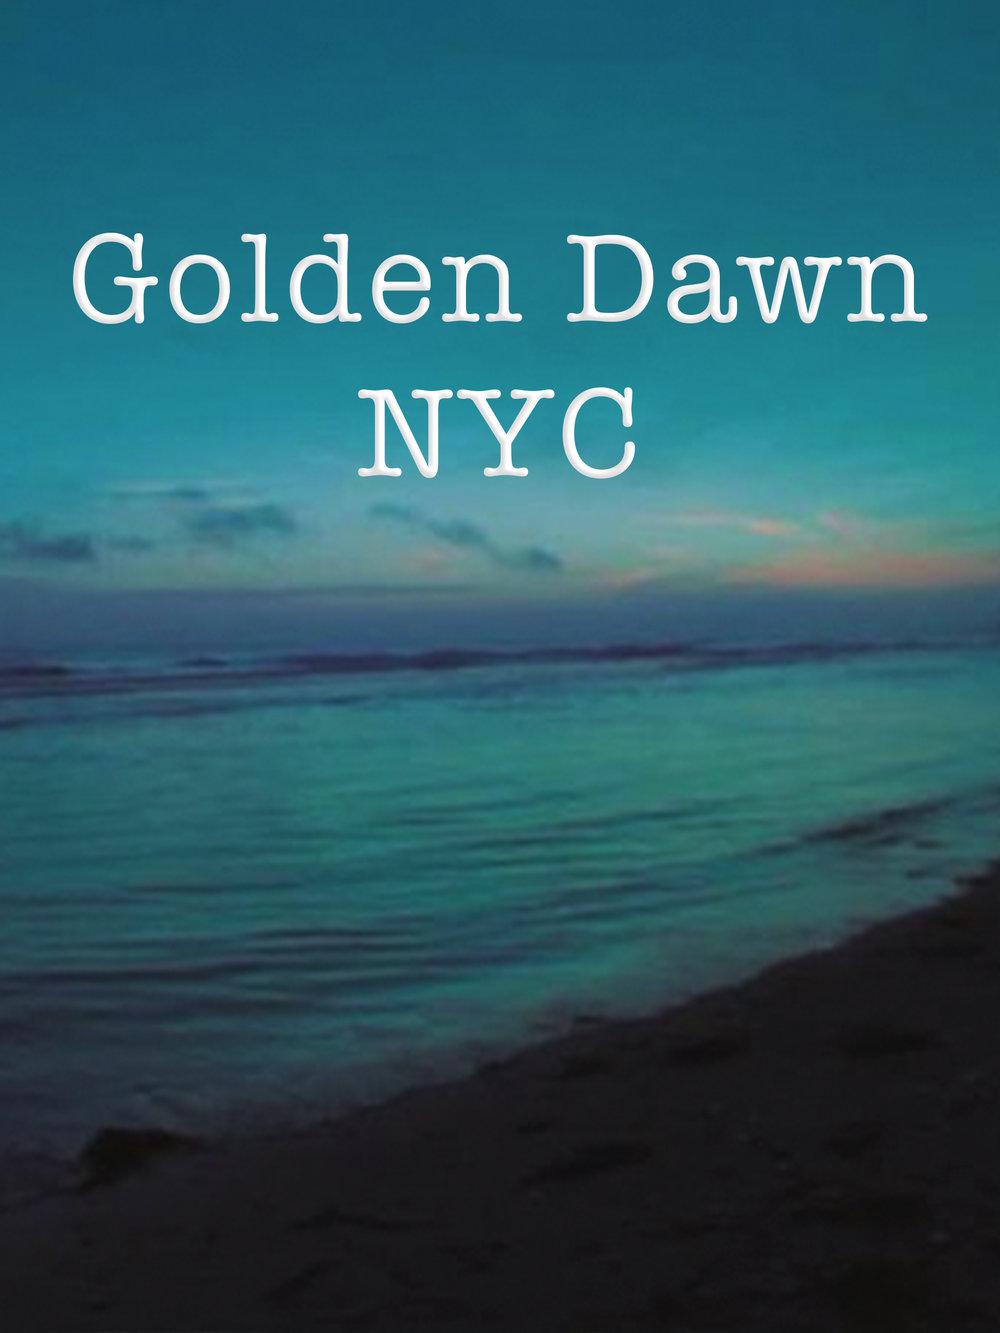 Golden Dawn NYC C Film By Richard Ledes.jpg